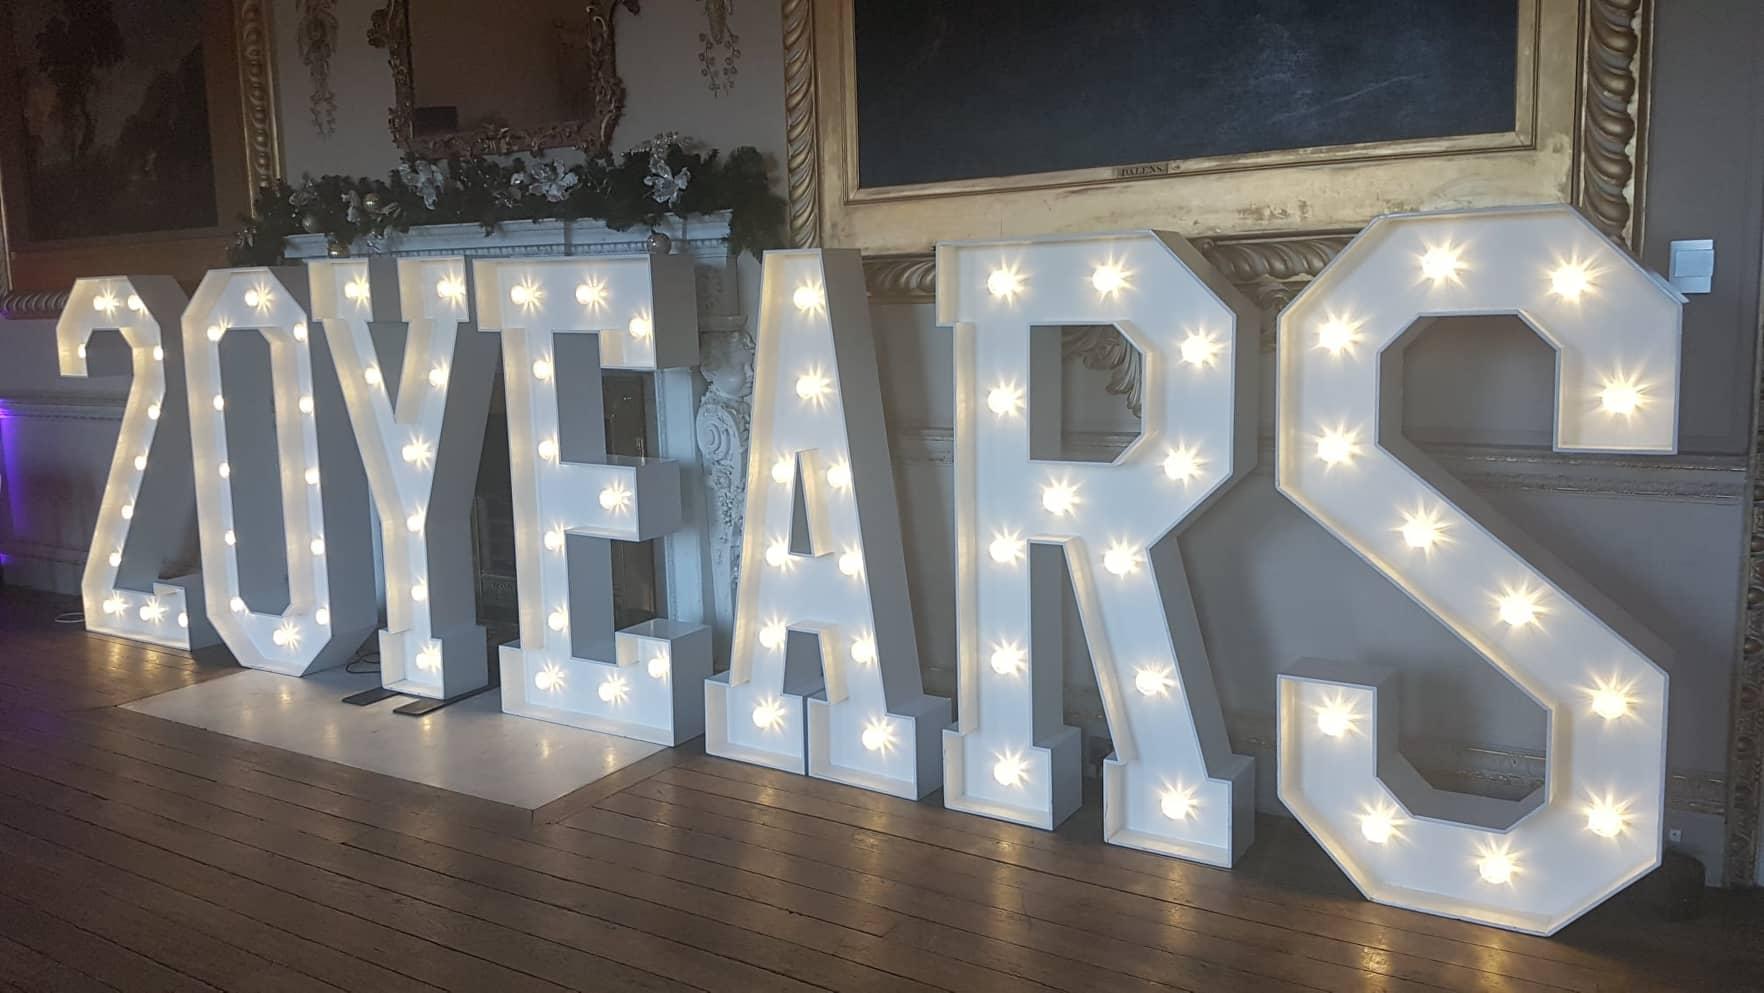 20 years timewise carton house company milestone anniversary birthday